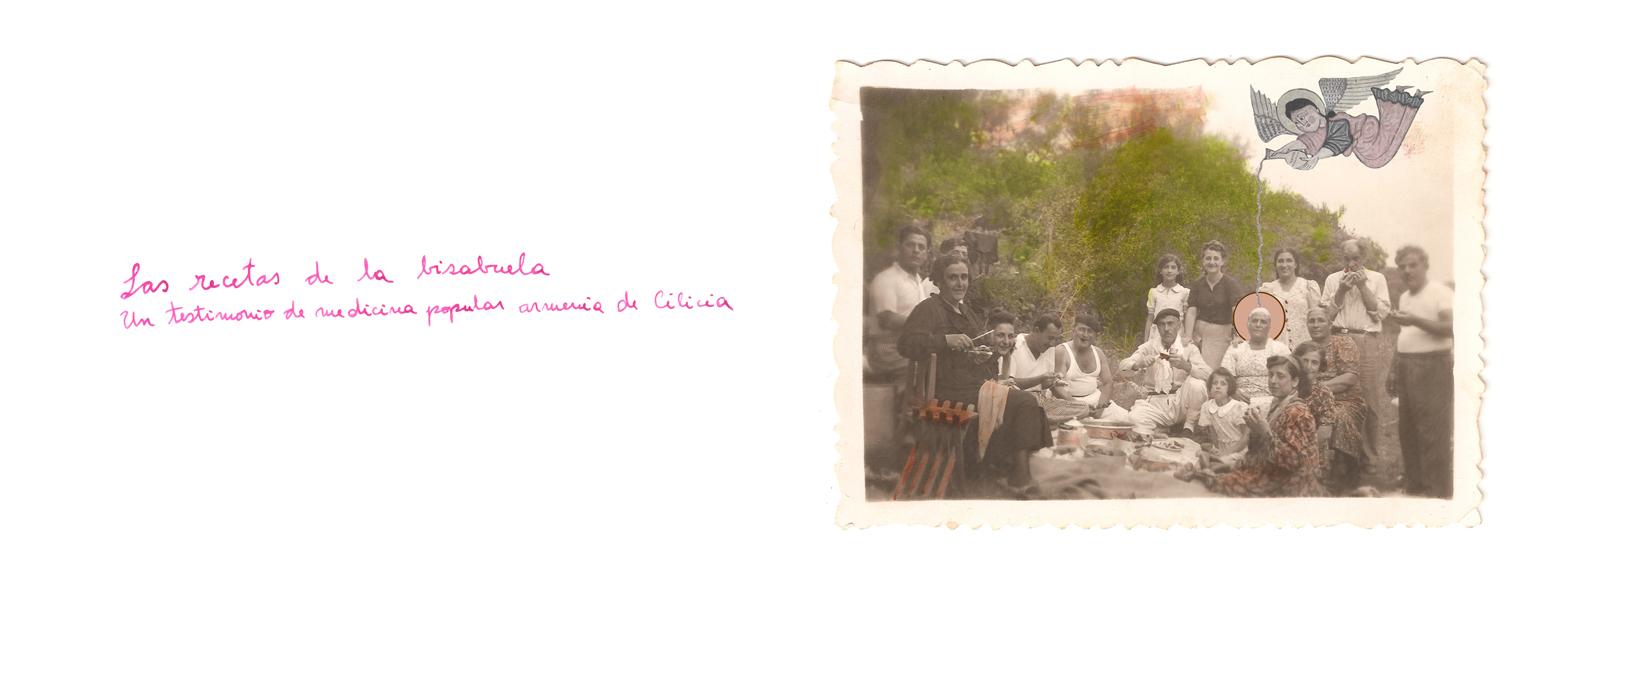 Silvina Der-Meguerditchian, Treasures, page 3, 2014